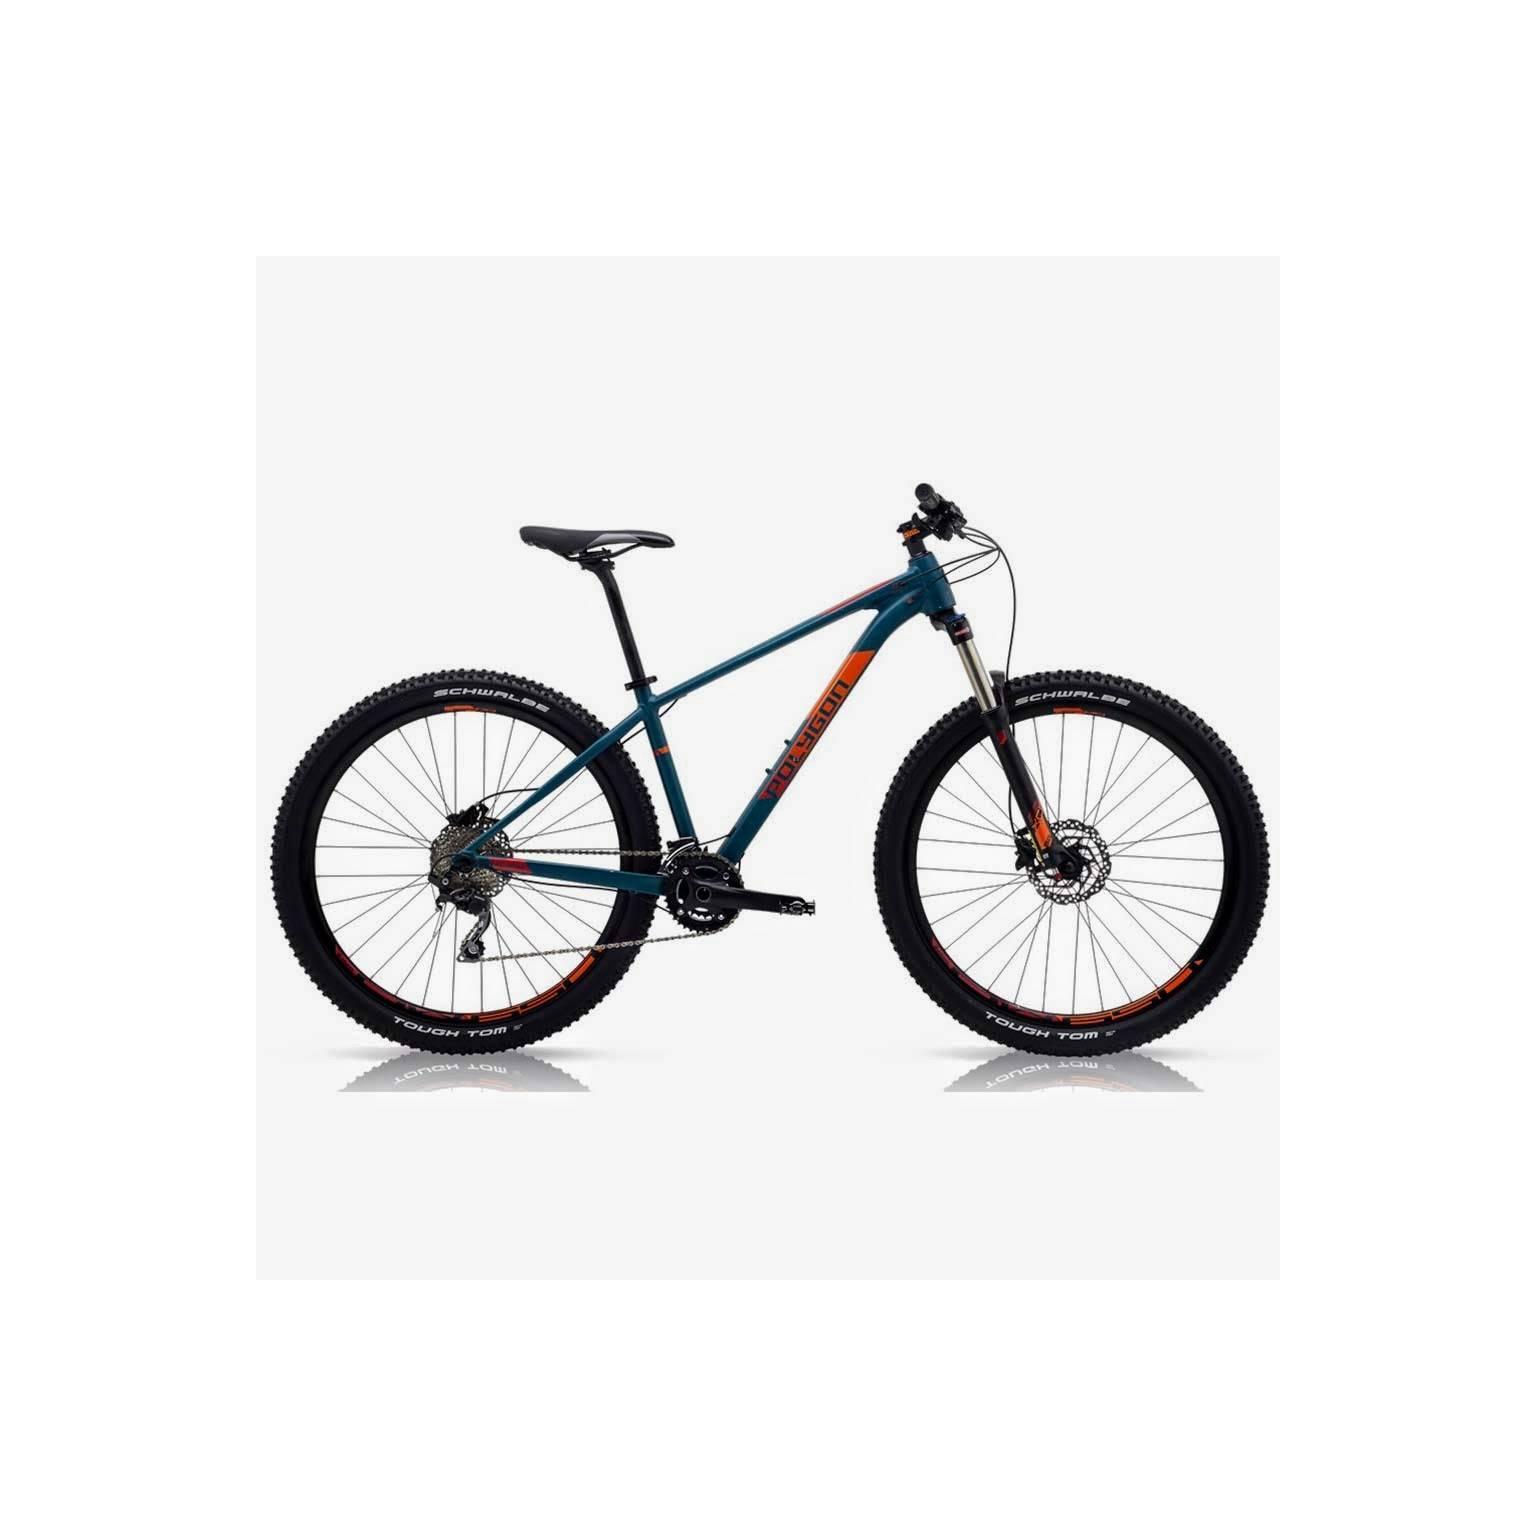 27.5in Polygon Xtrada 6 ALX 2x10Sp Cakram Hidraulis Sepeda Gunung XC